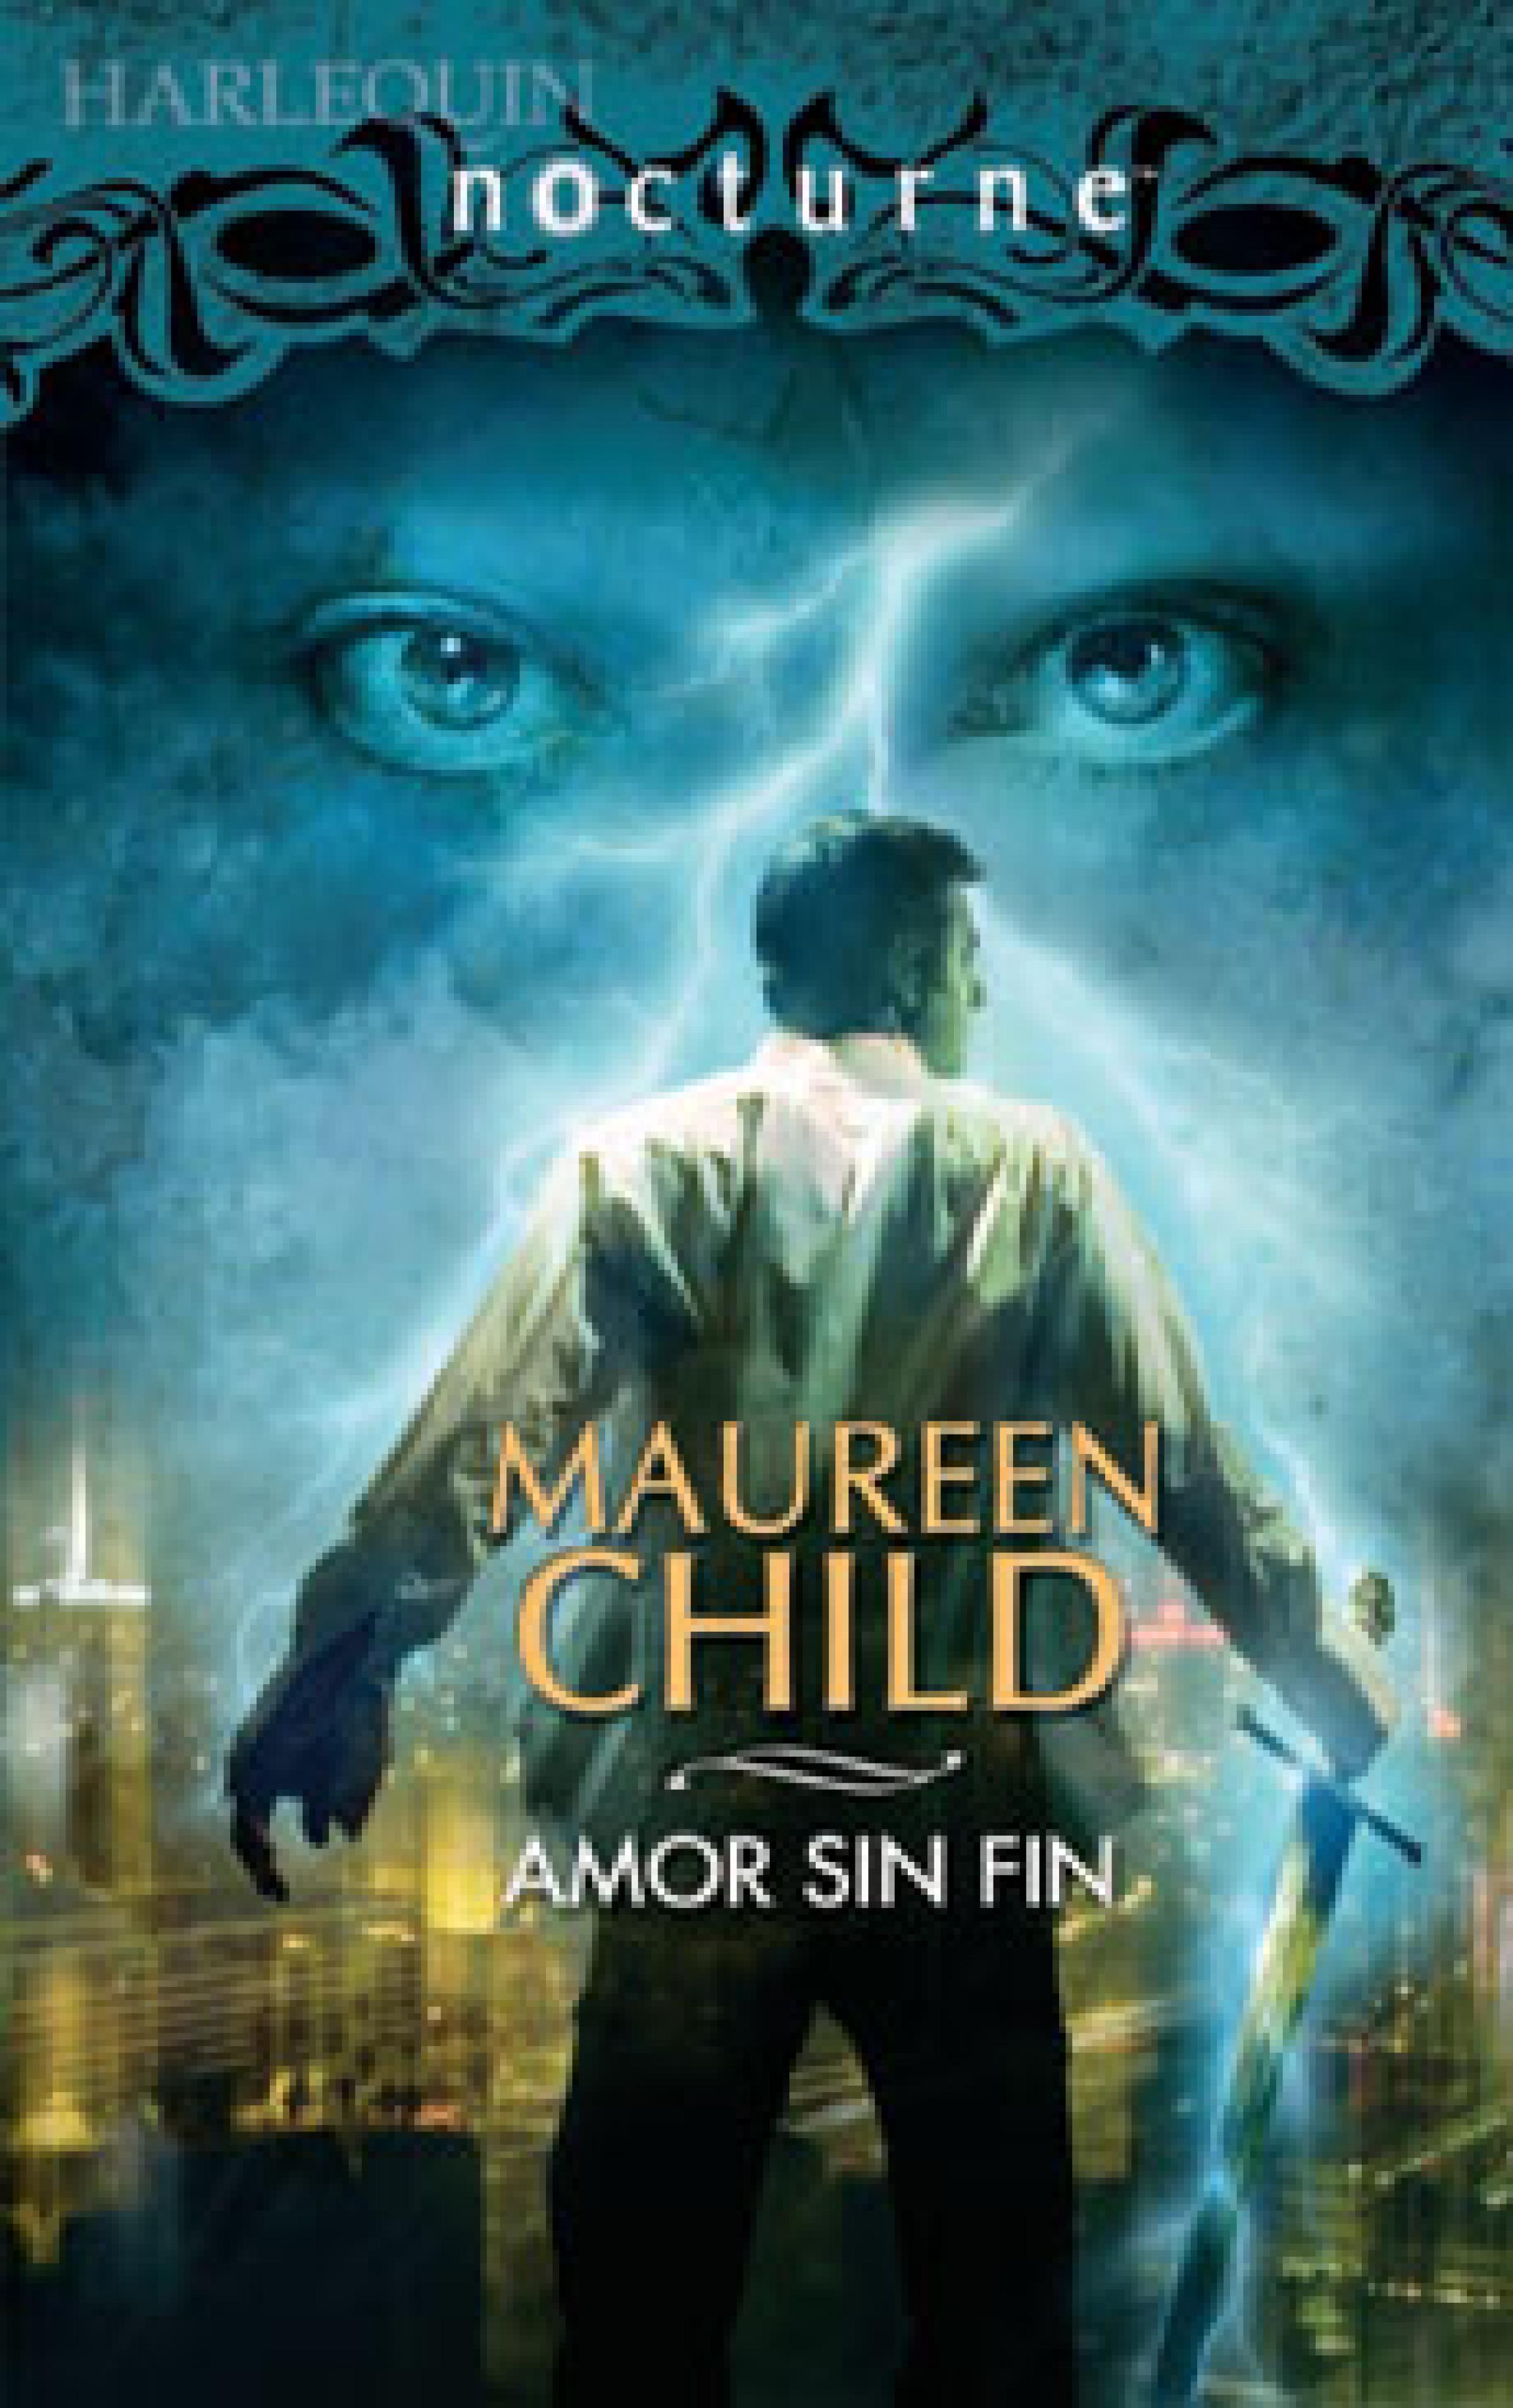 Maureen Child Amor sin fin недорого